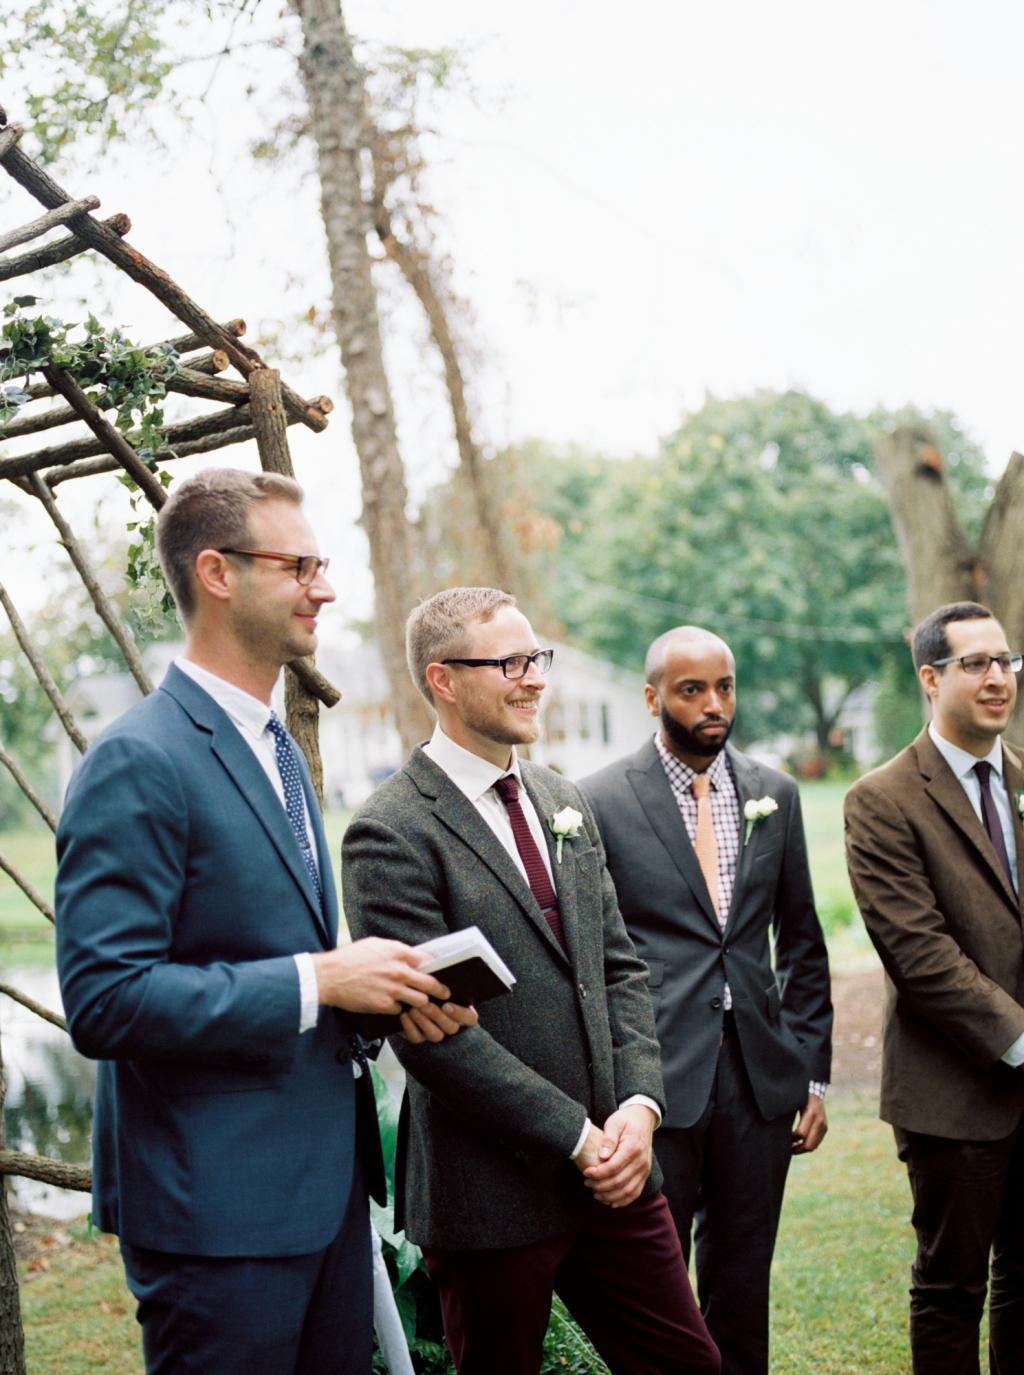 haley-richter-photography-new-jersey-backyard-wedding-206